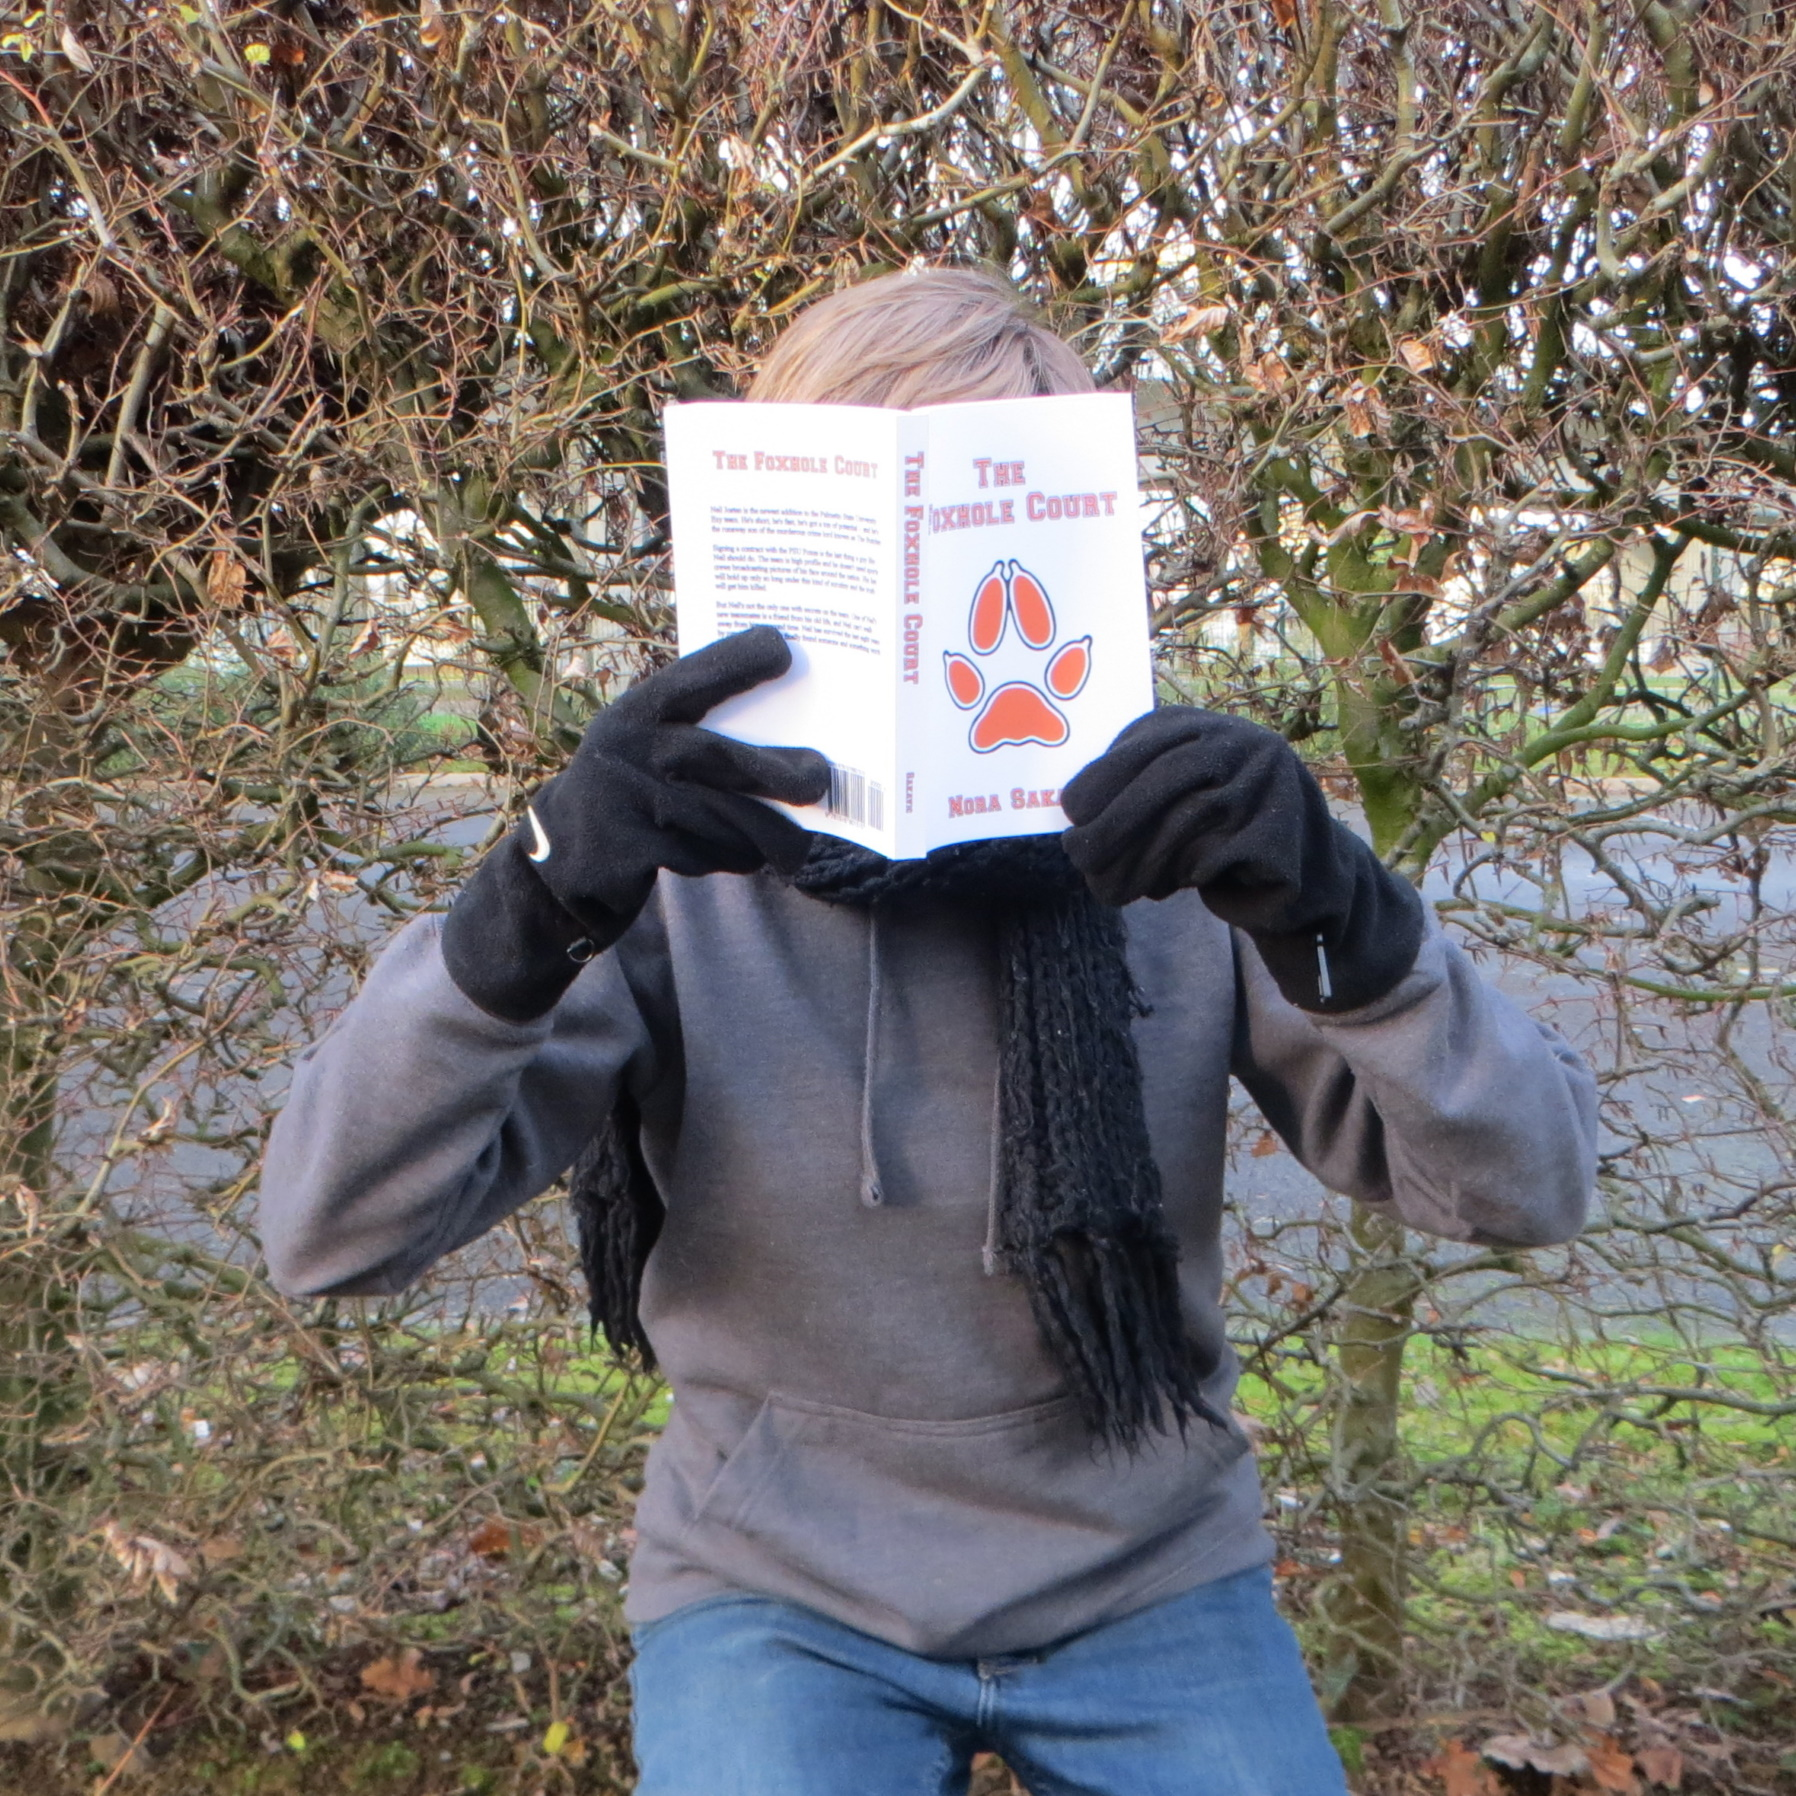 personne en pull et écharpe lisant All for the Game tome 1 : The Foxhole Court de Nora Sakavic devant une haie effeuillée